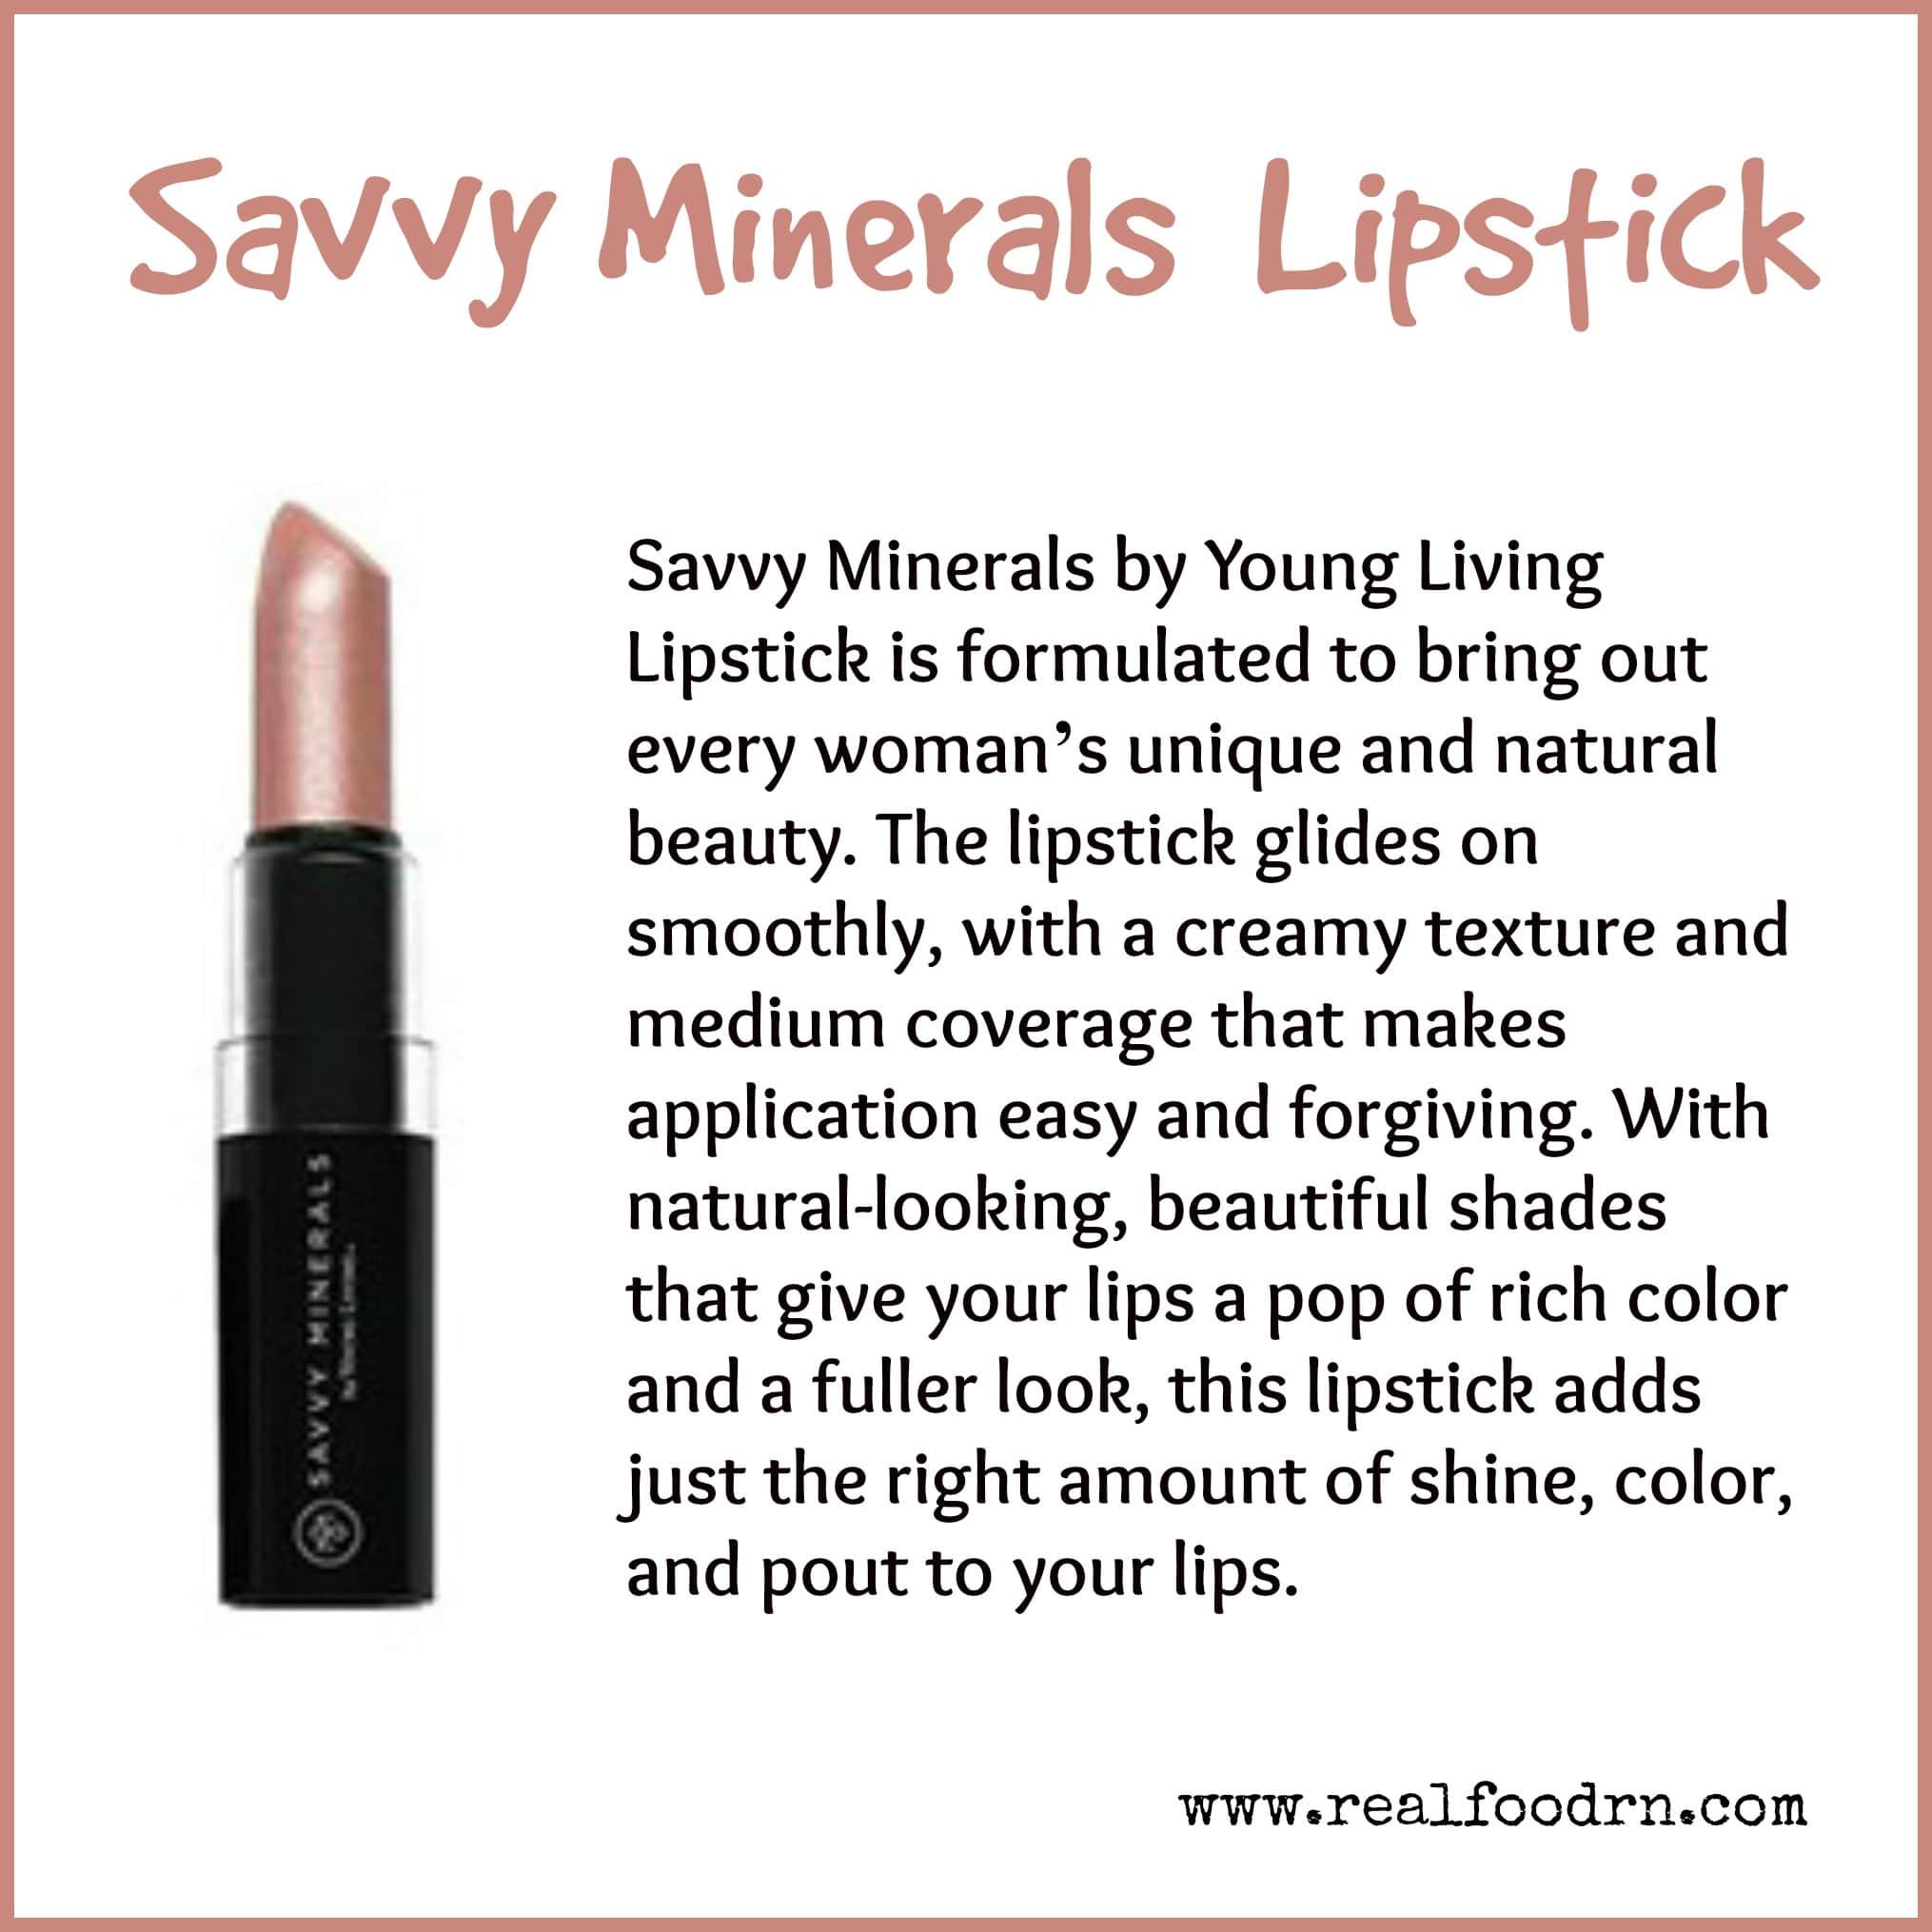 Savvy Minerals Lipstick